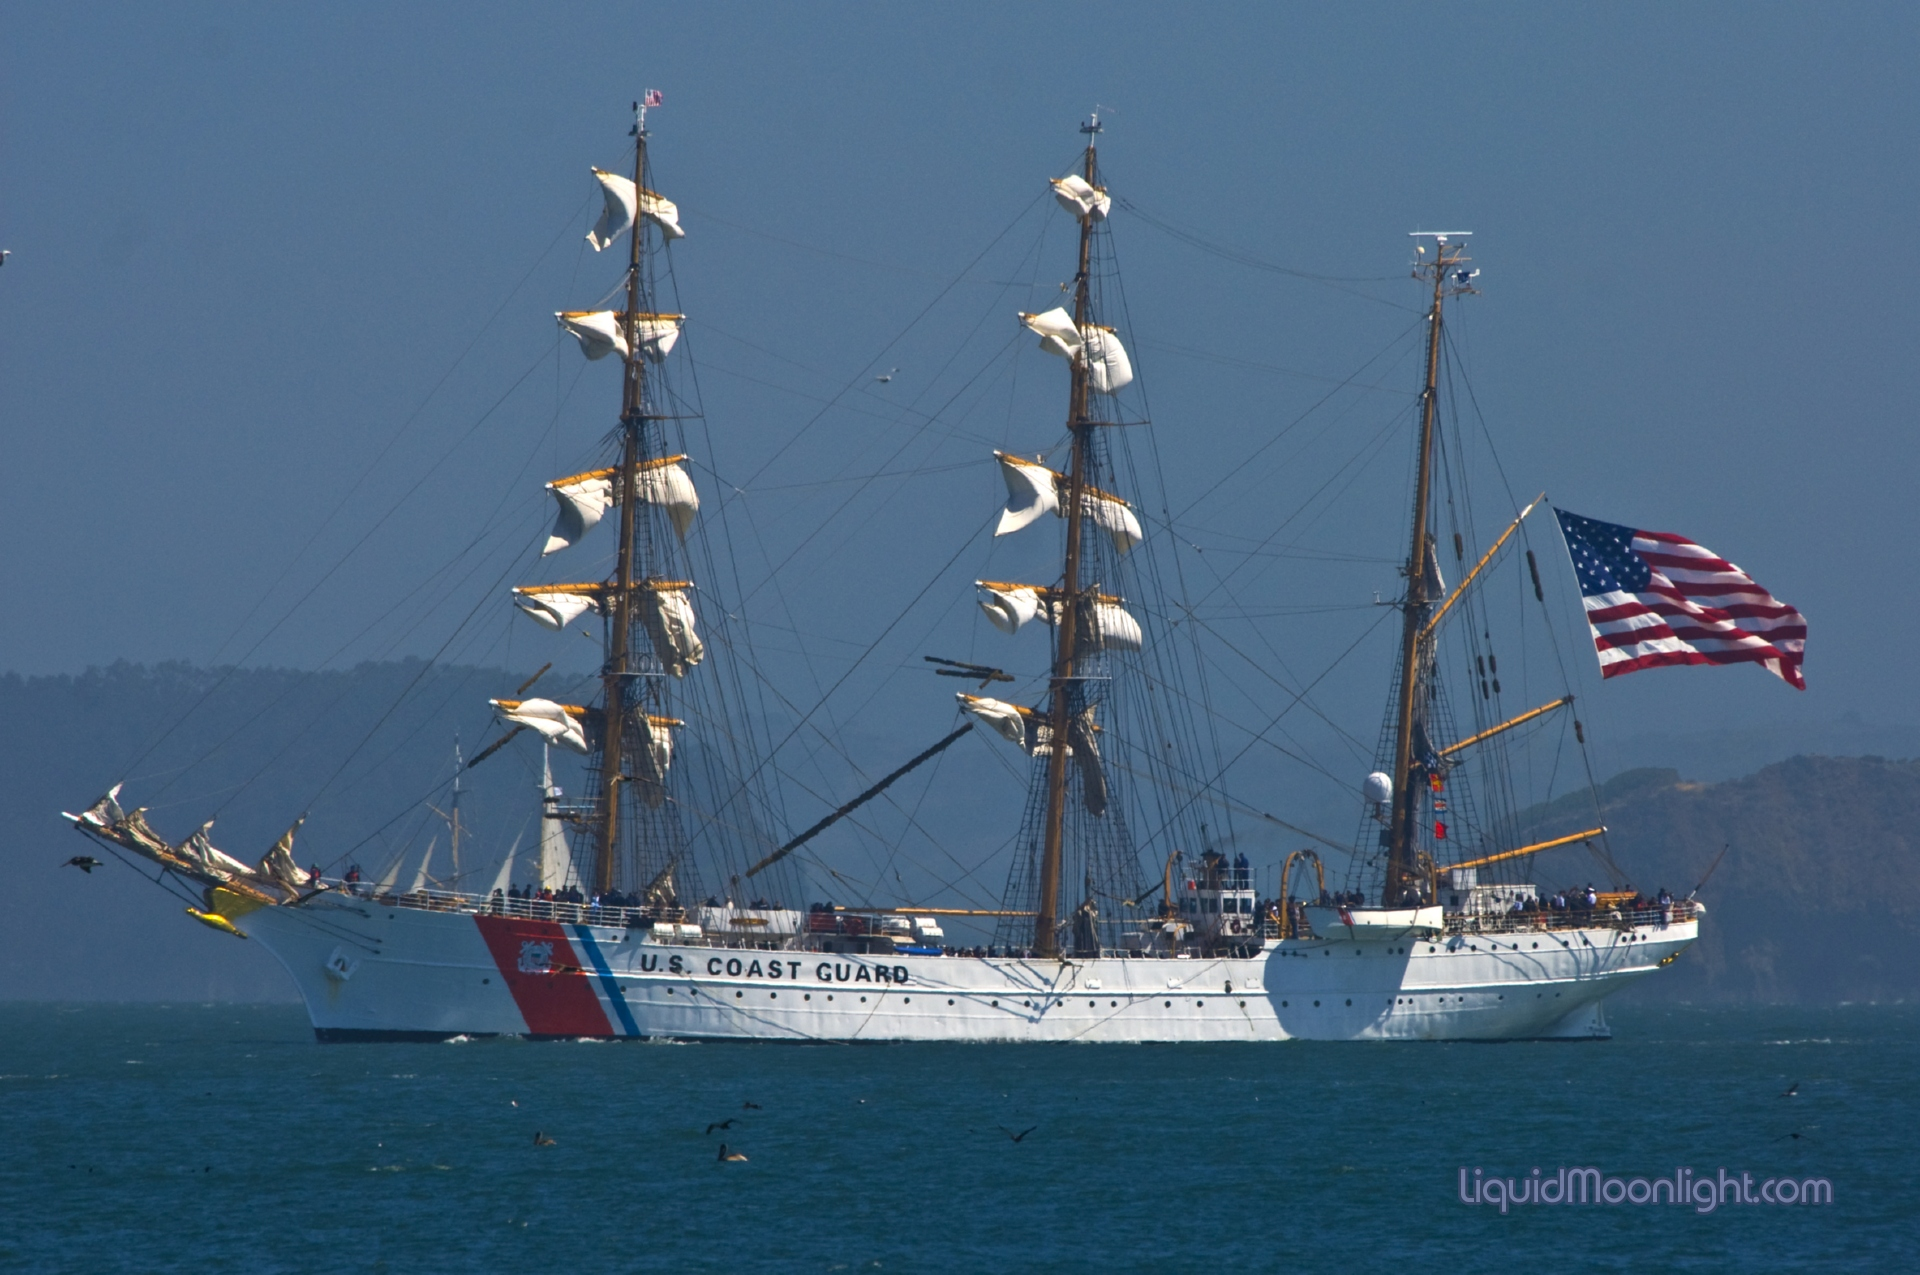 gallery for coast guard wallpaper eagle